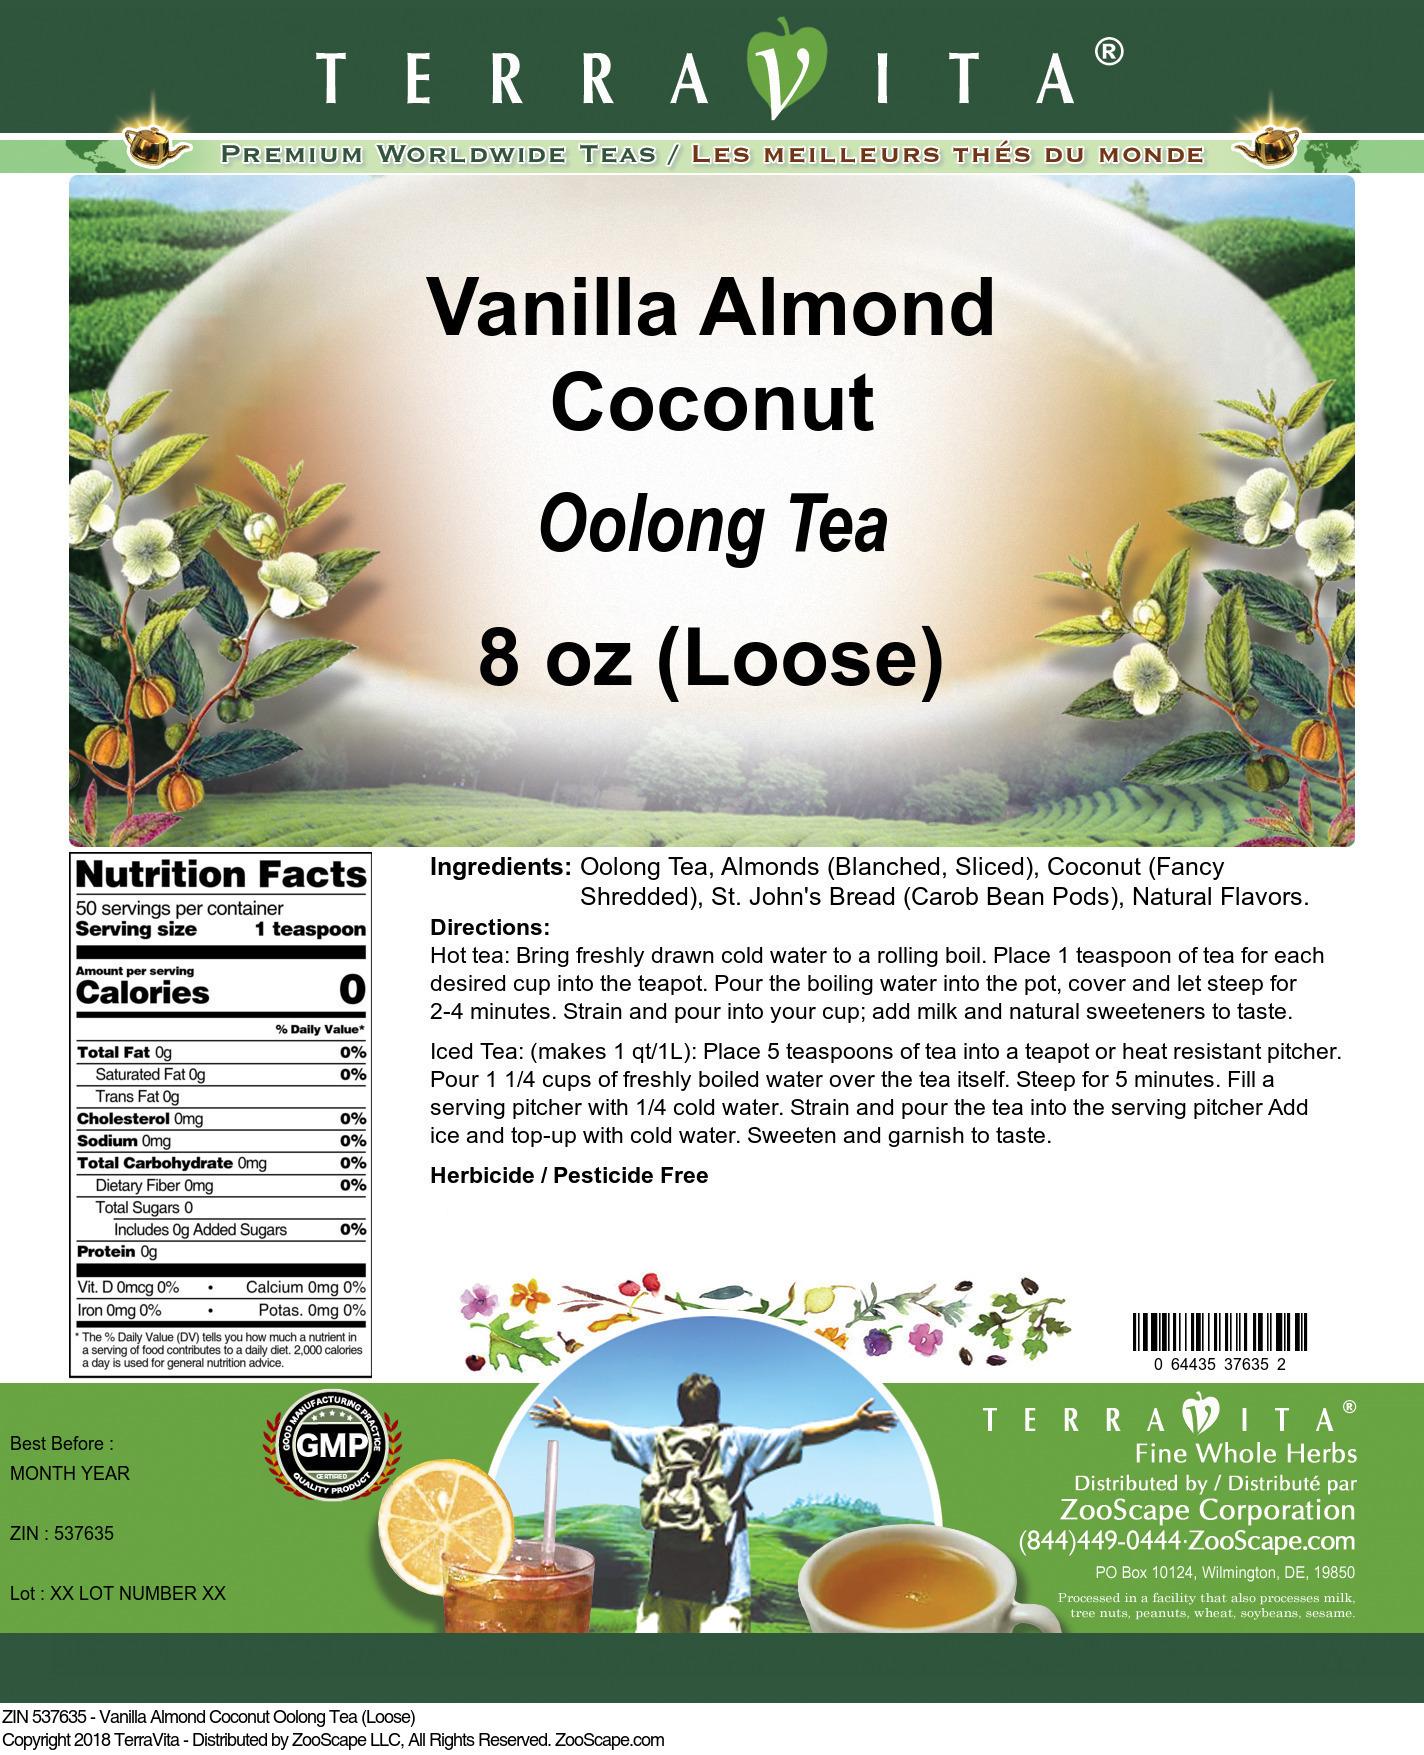 Vanilla Almond Coconut Oolong Tea